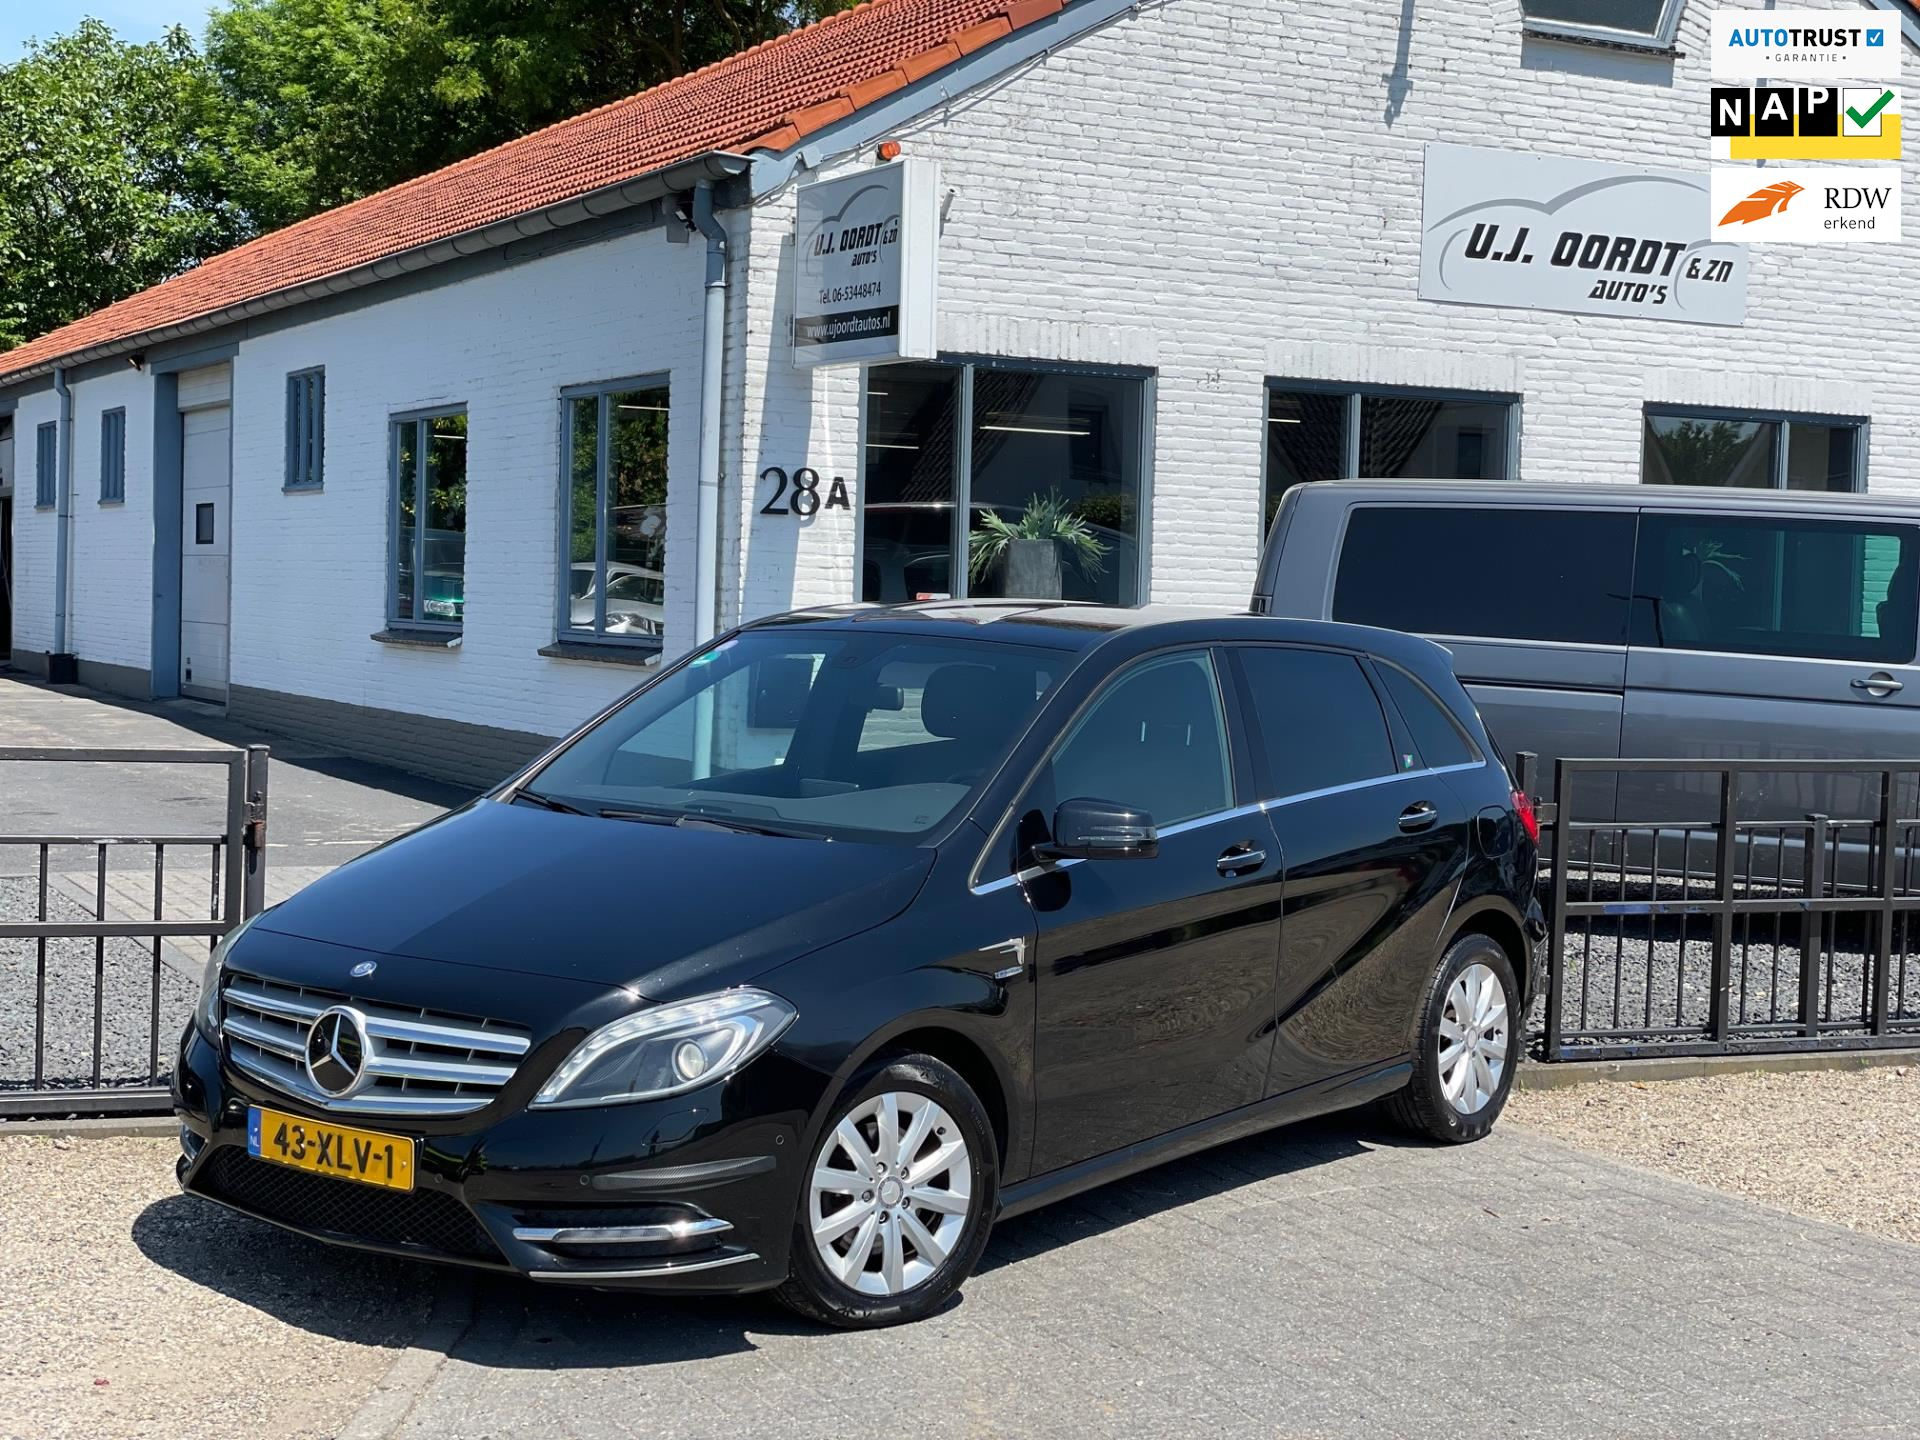 Mercedes-Benz B-klasse occasion - U.J. Oordt Auto's